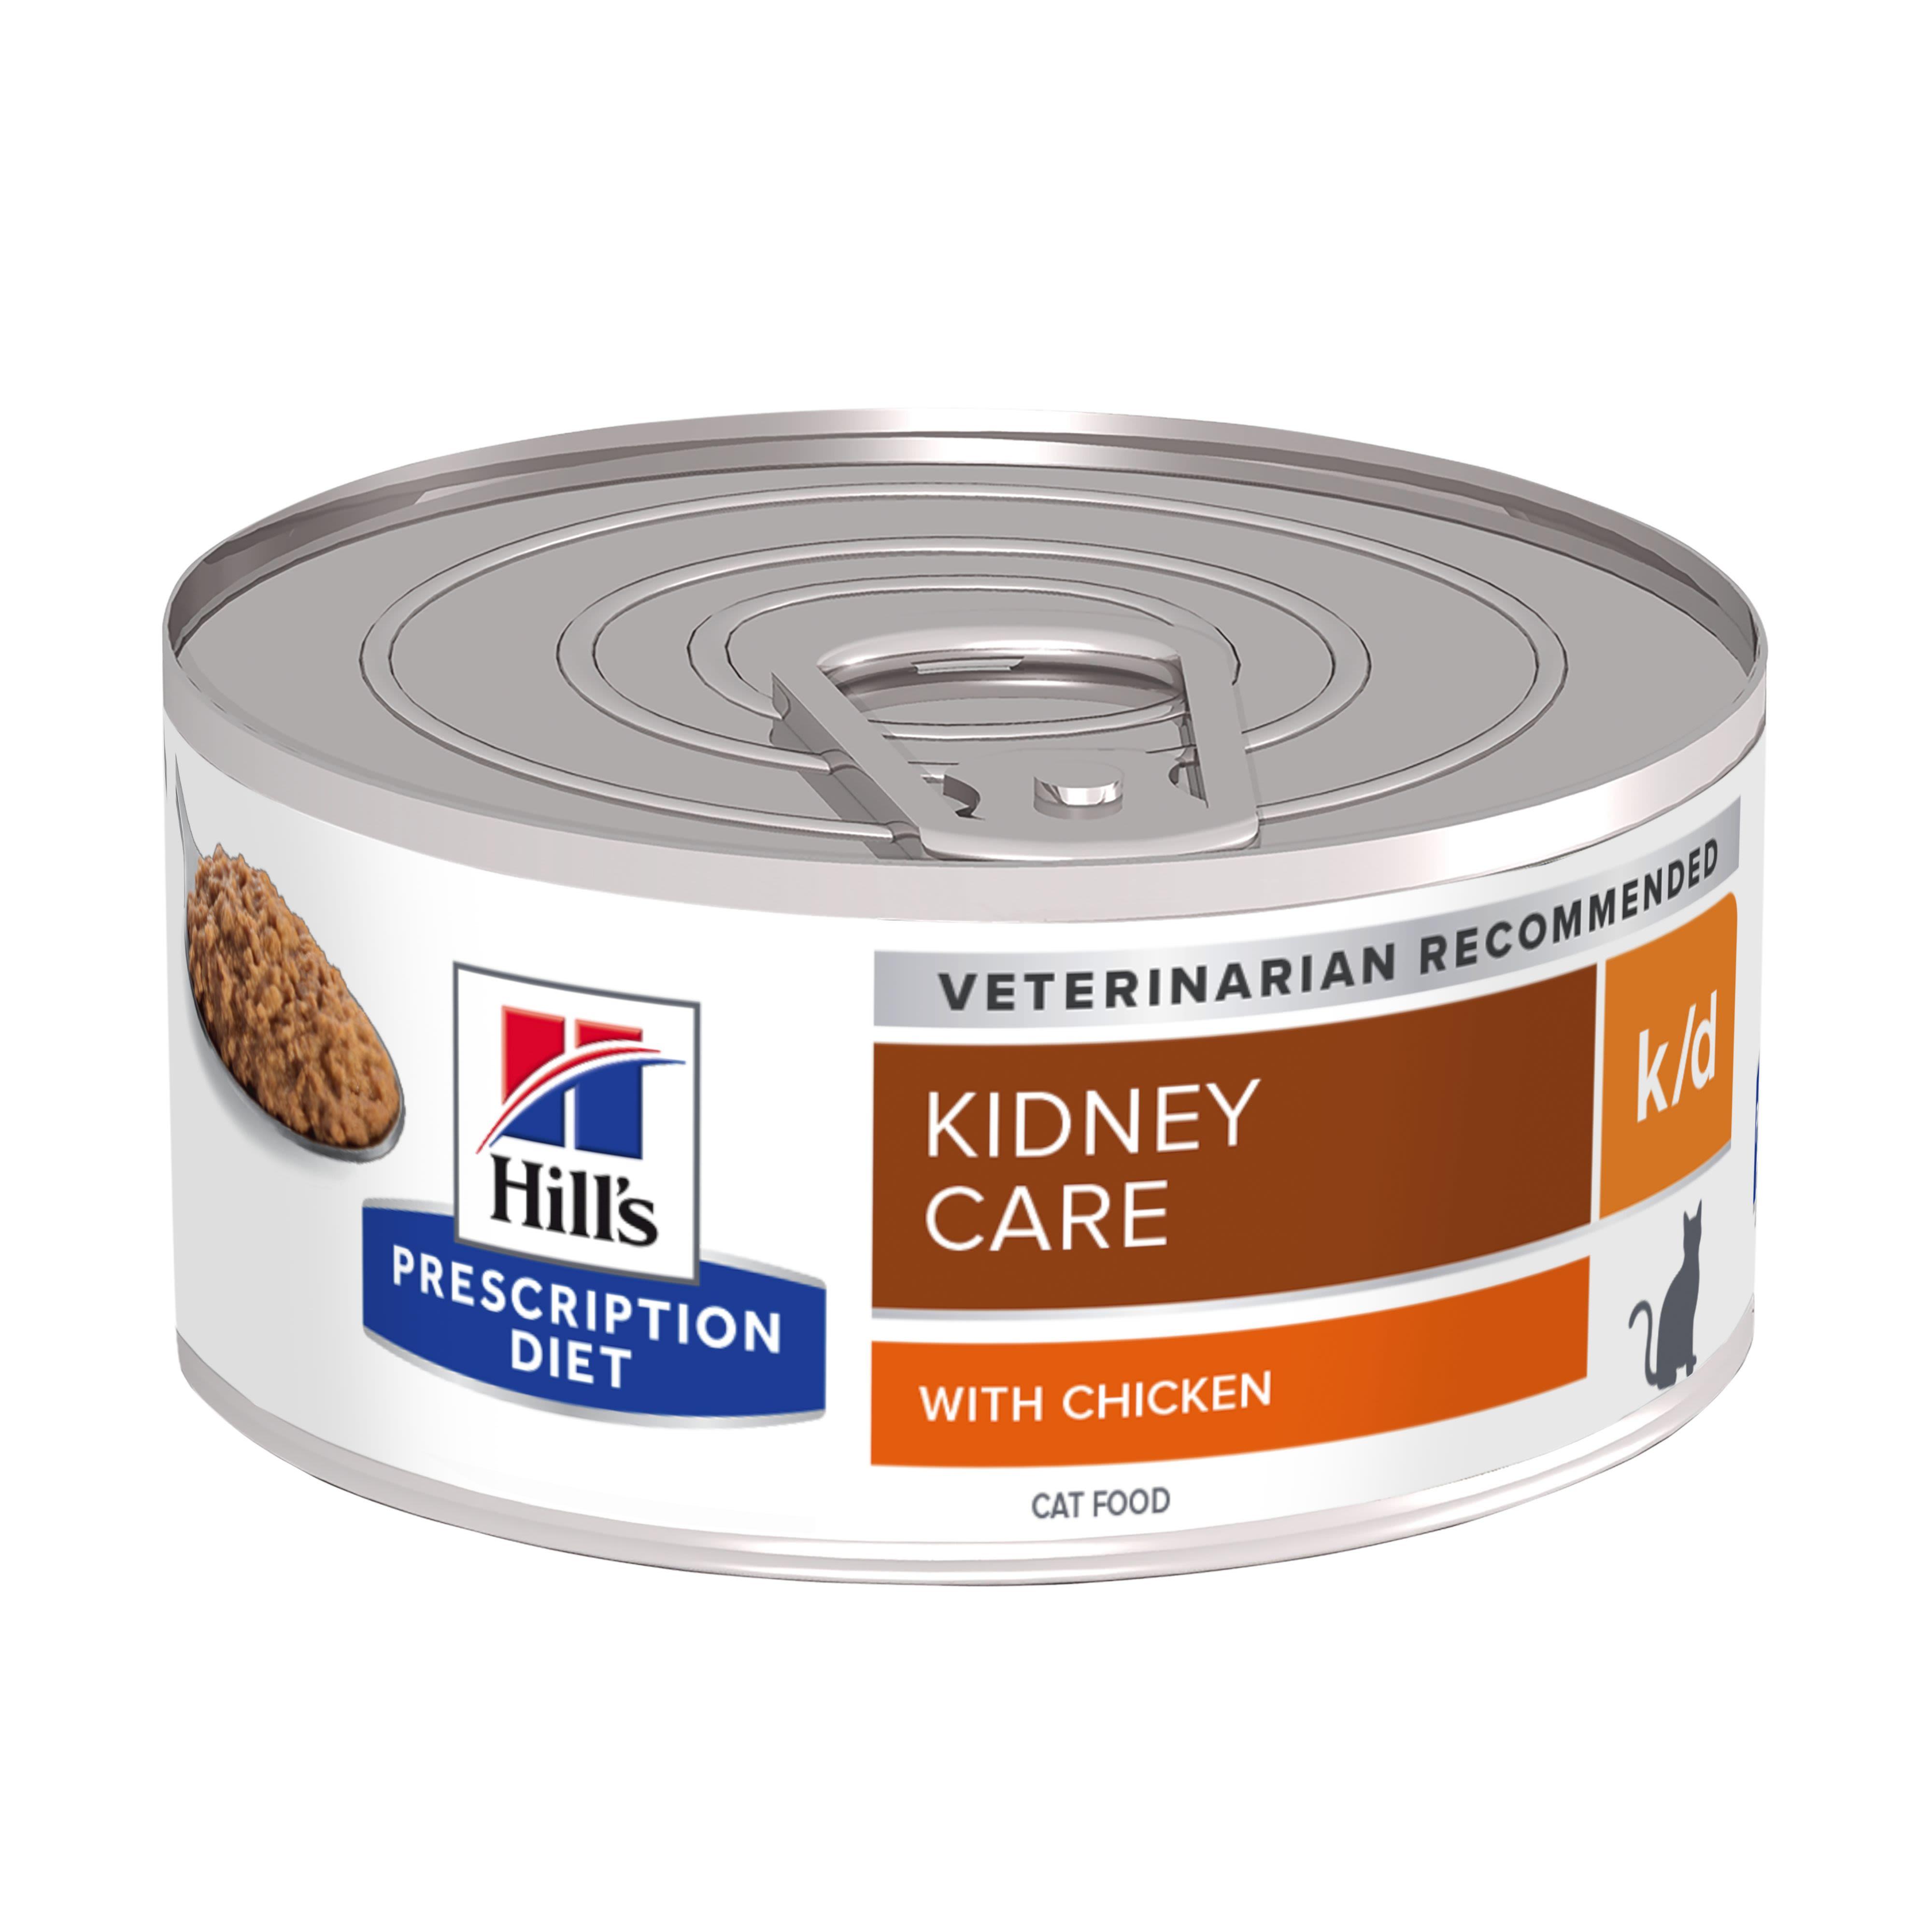 Hills prescription feline k/d